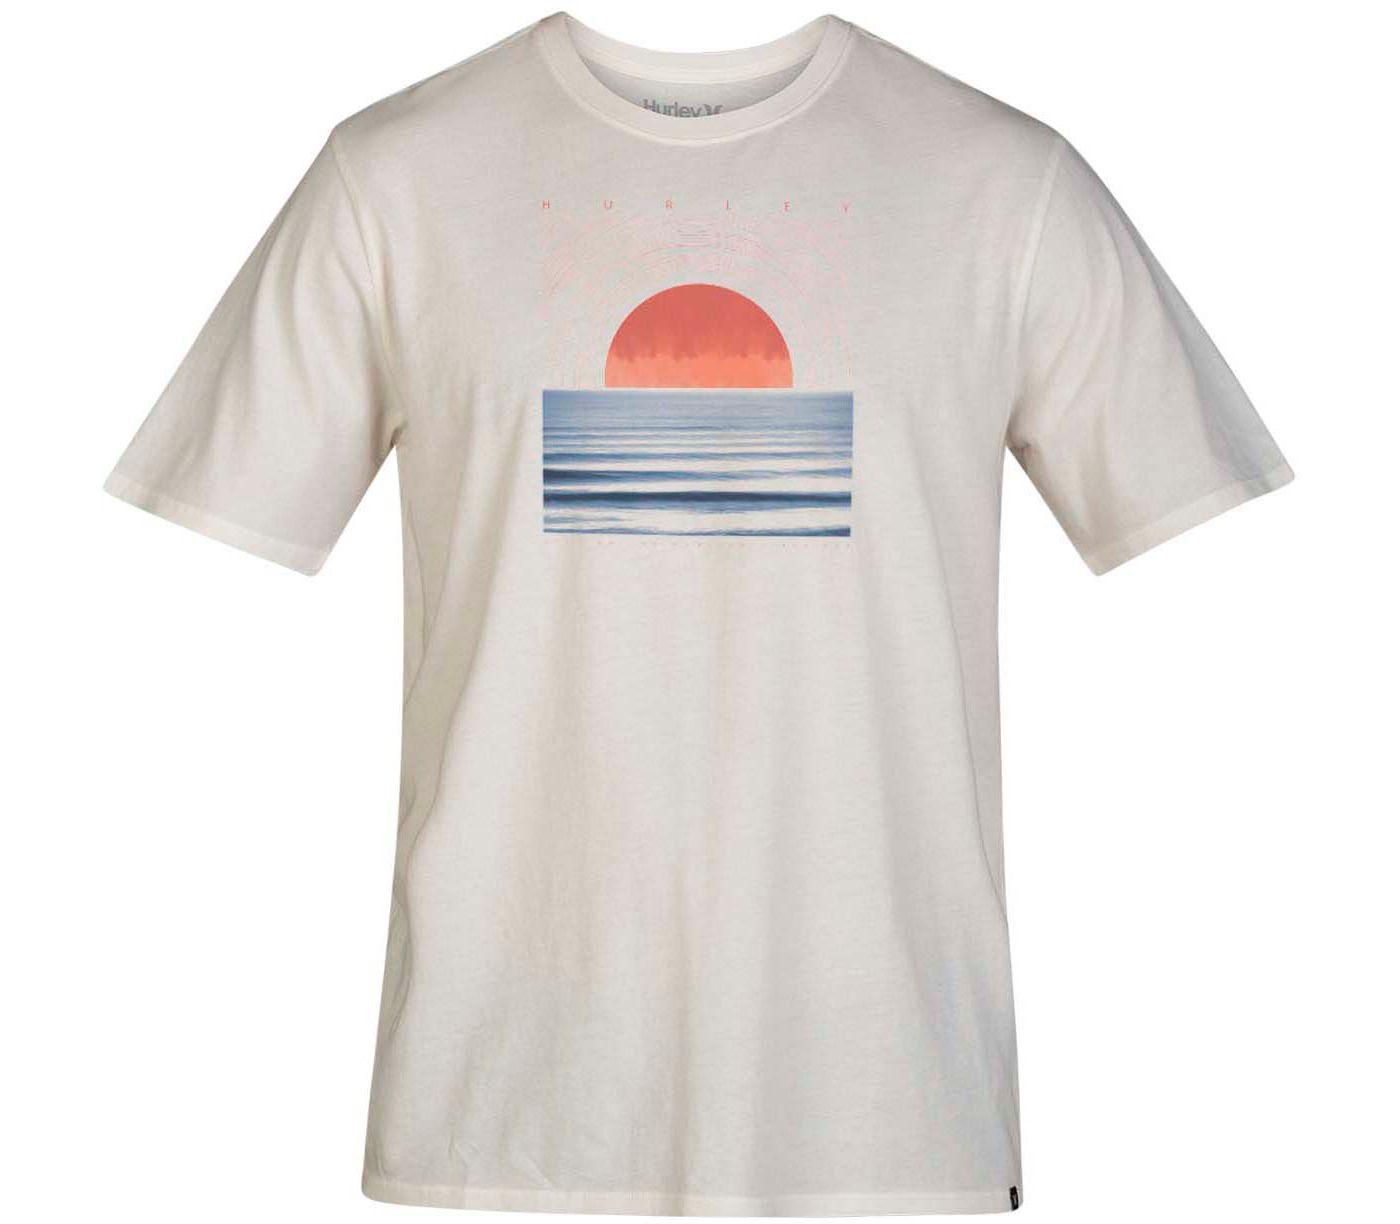 Hurley Men's Subliminal Short Sleeve T-Shirt